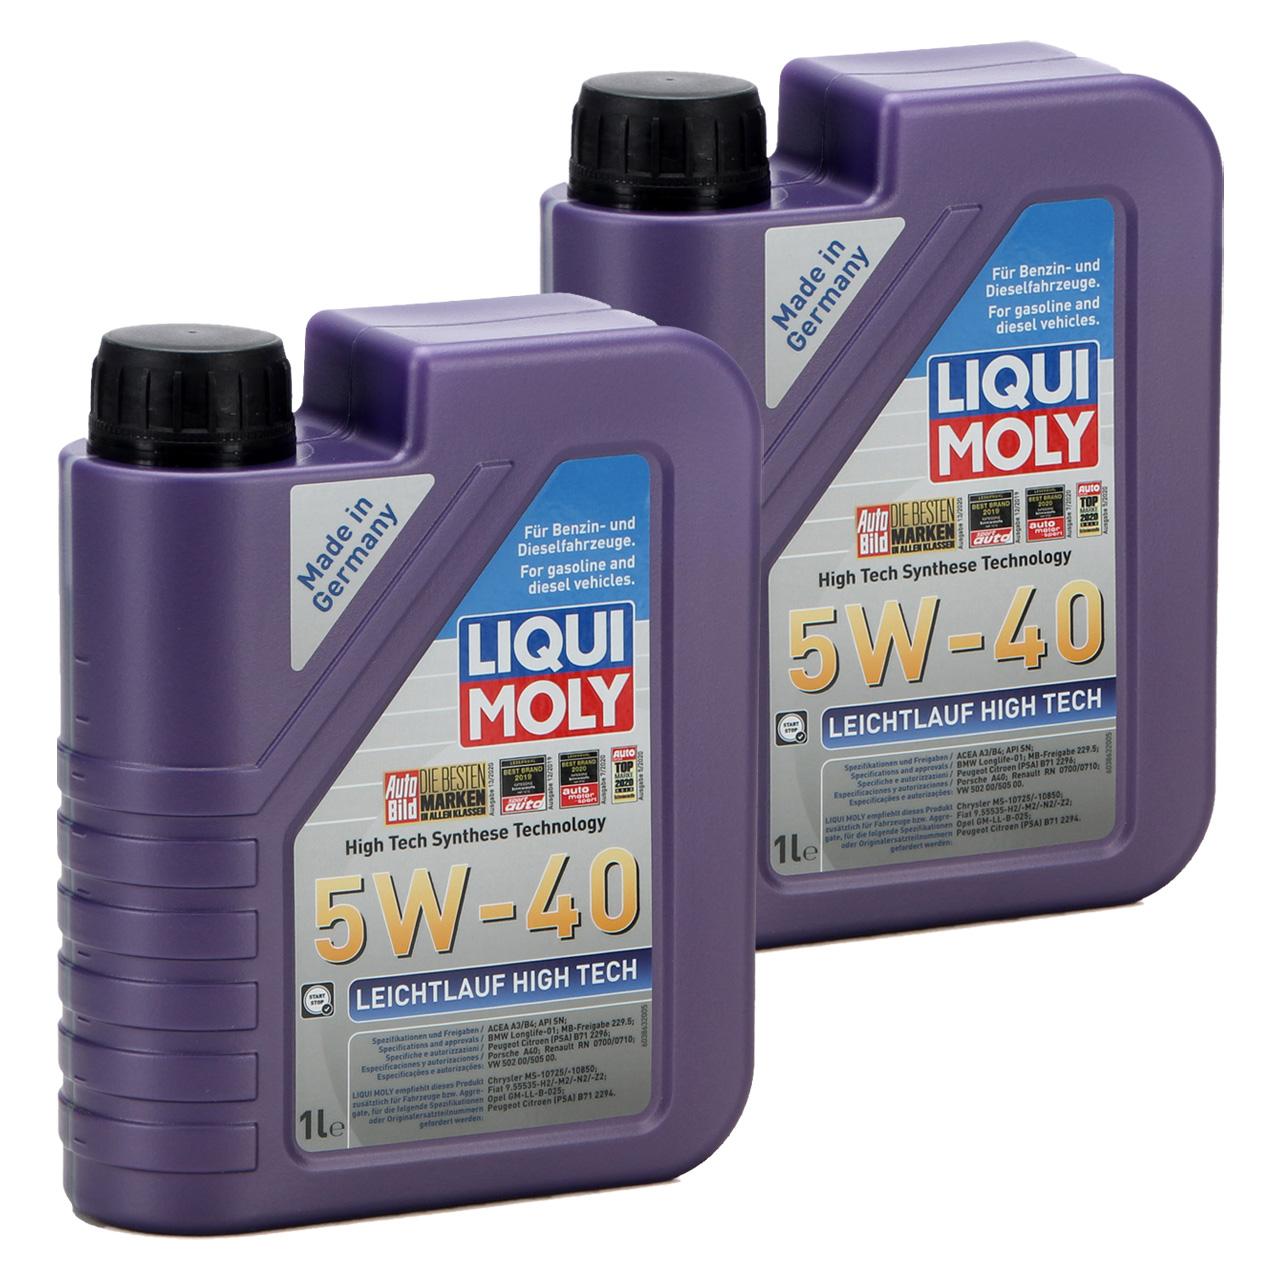 LIQUI MOLY Motoröl Öl Leichtlauf HIGH TECH 5W40 BMW LL-01 MB 229.5 - 2L 2 Liter